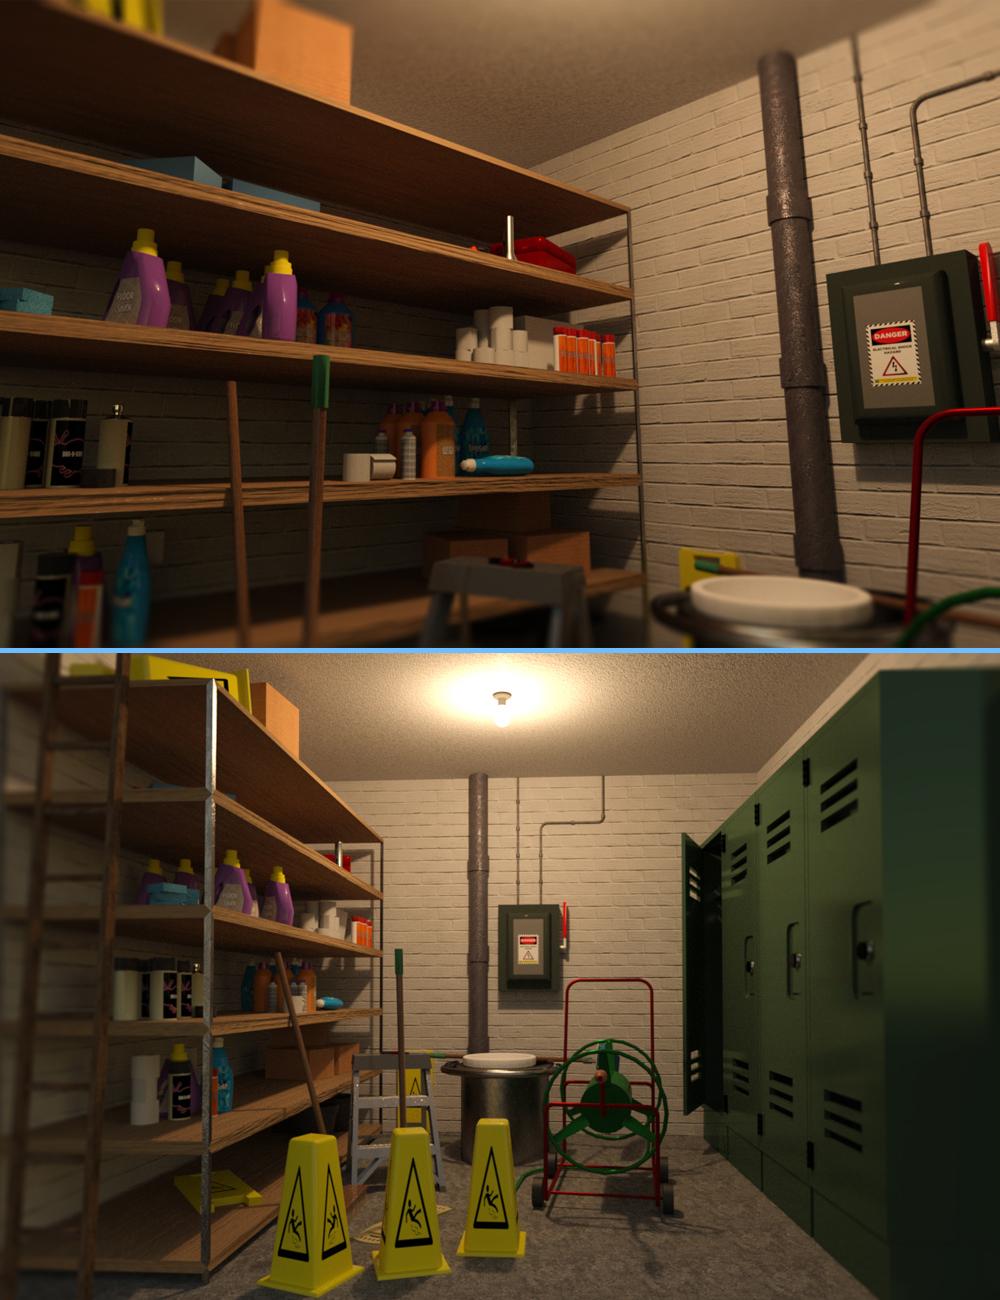 Maintenance Room by: Digitallab3D, 3D Models by Daz 3D